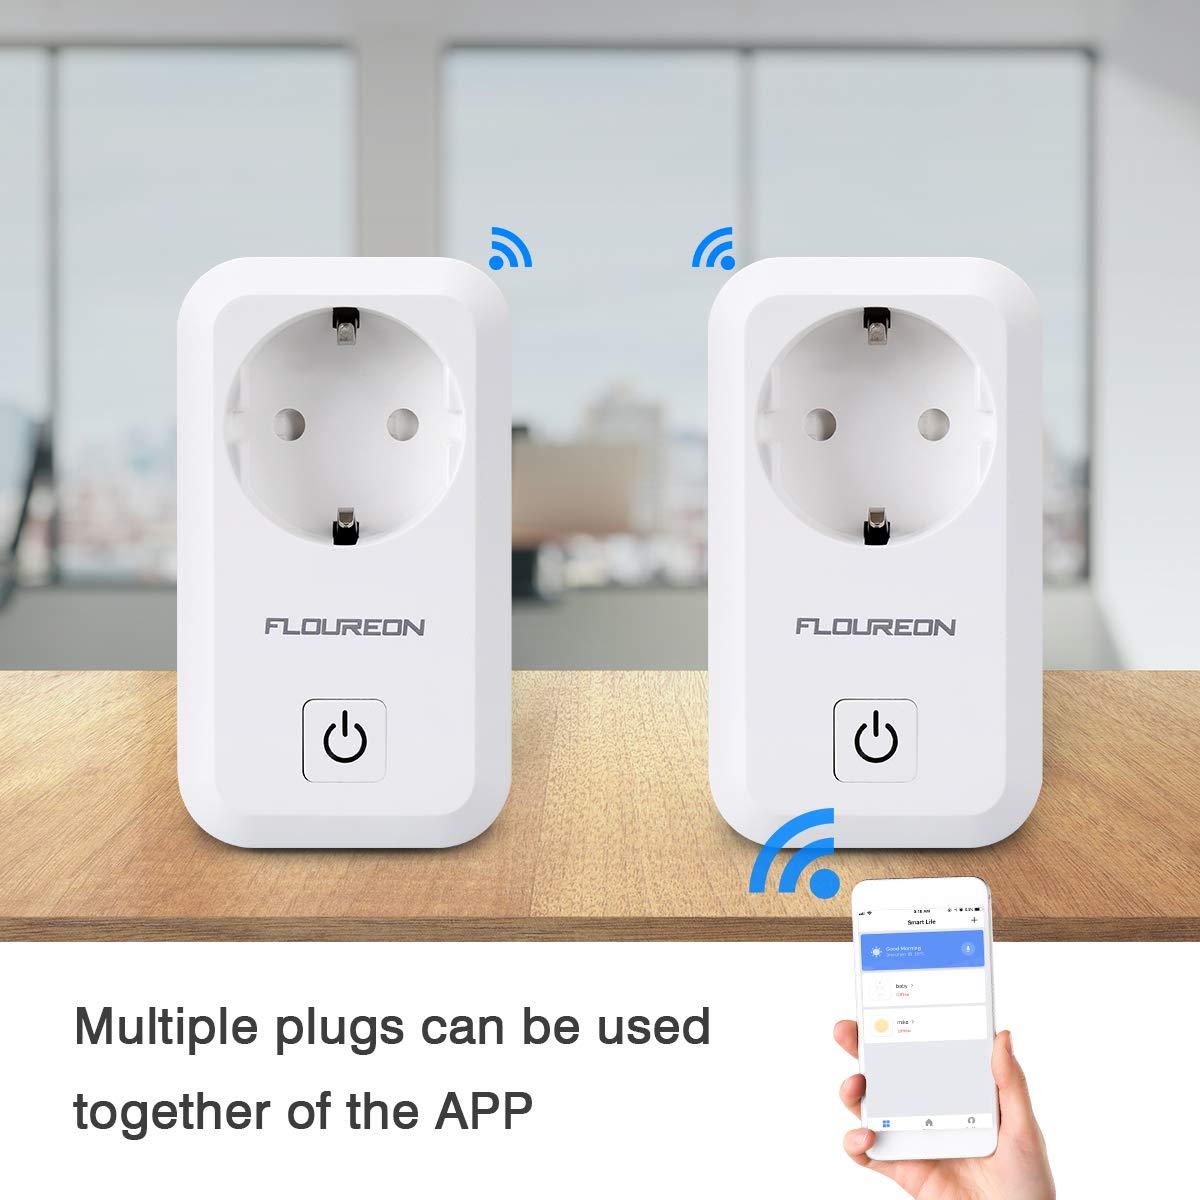 FLOUREON WLAN Smart Steckdose, Wifi Plug, Smart Home Fernbedienung für iOS Android App, Kompatibel mit Amazon Alexa Echo Google Home (2 Pack)